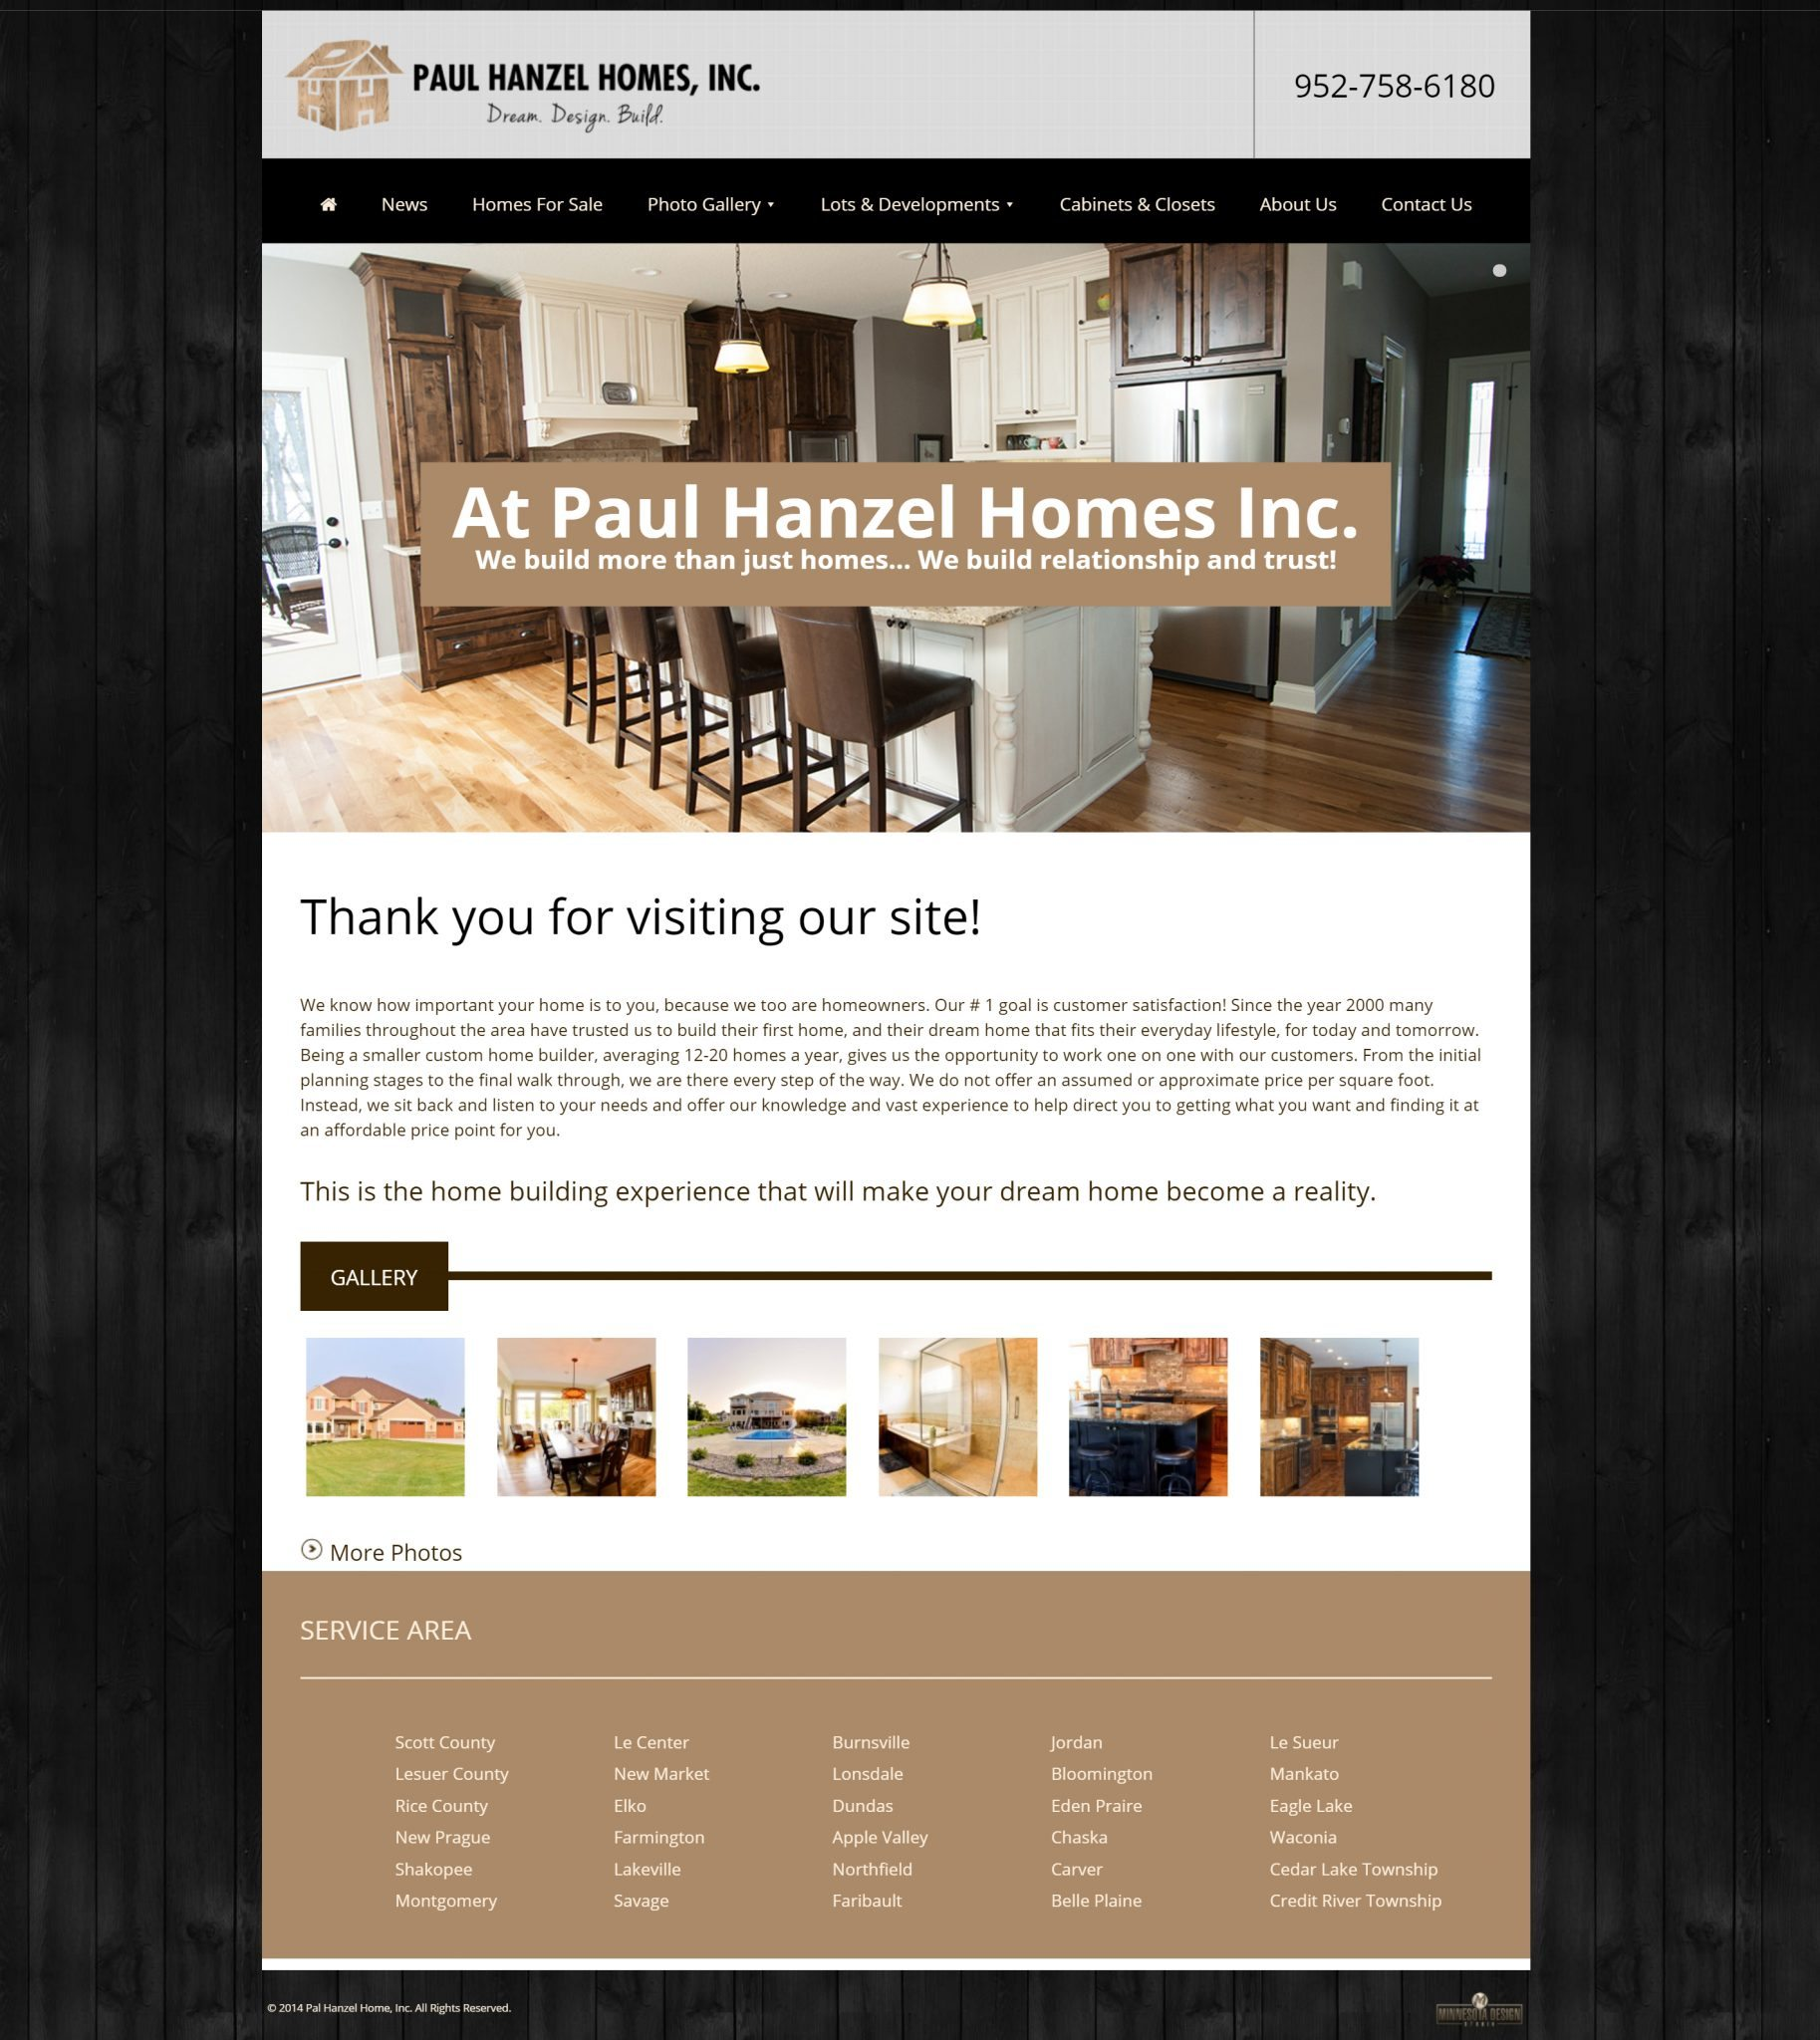 Paul Hanzel Homes, Inc.